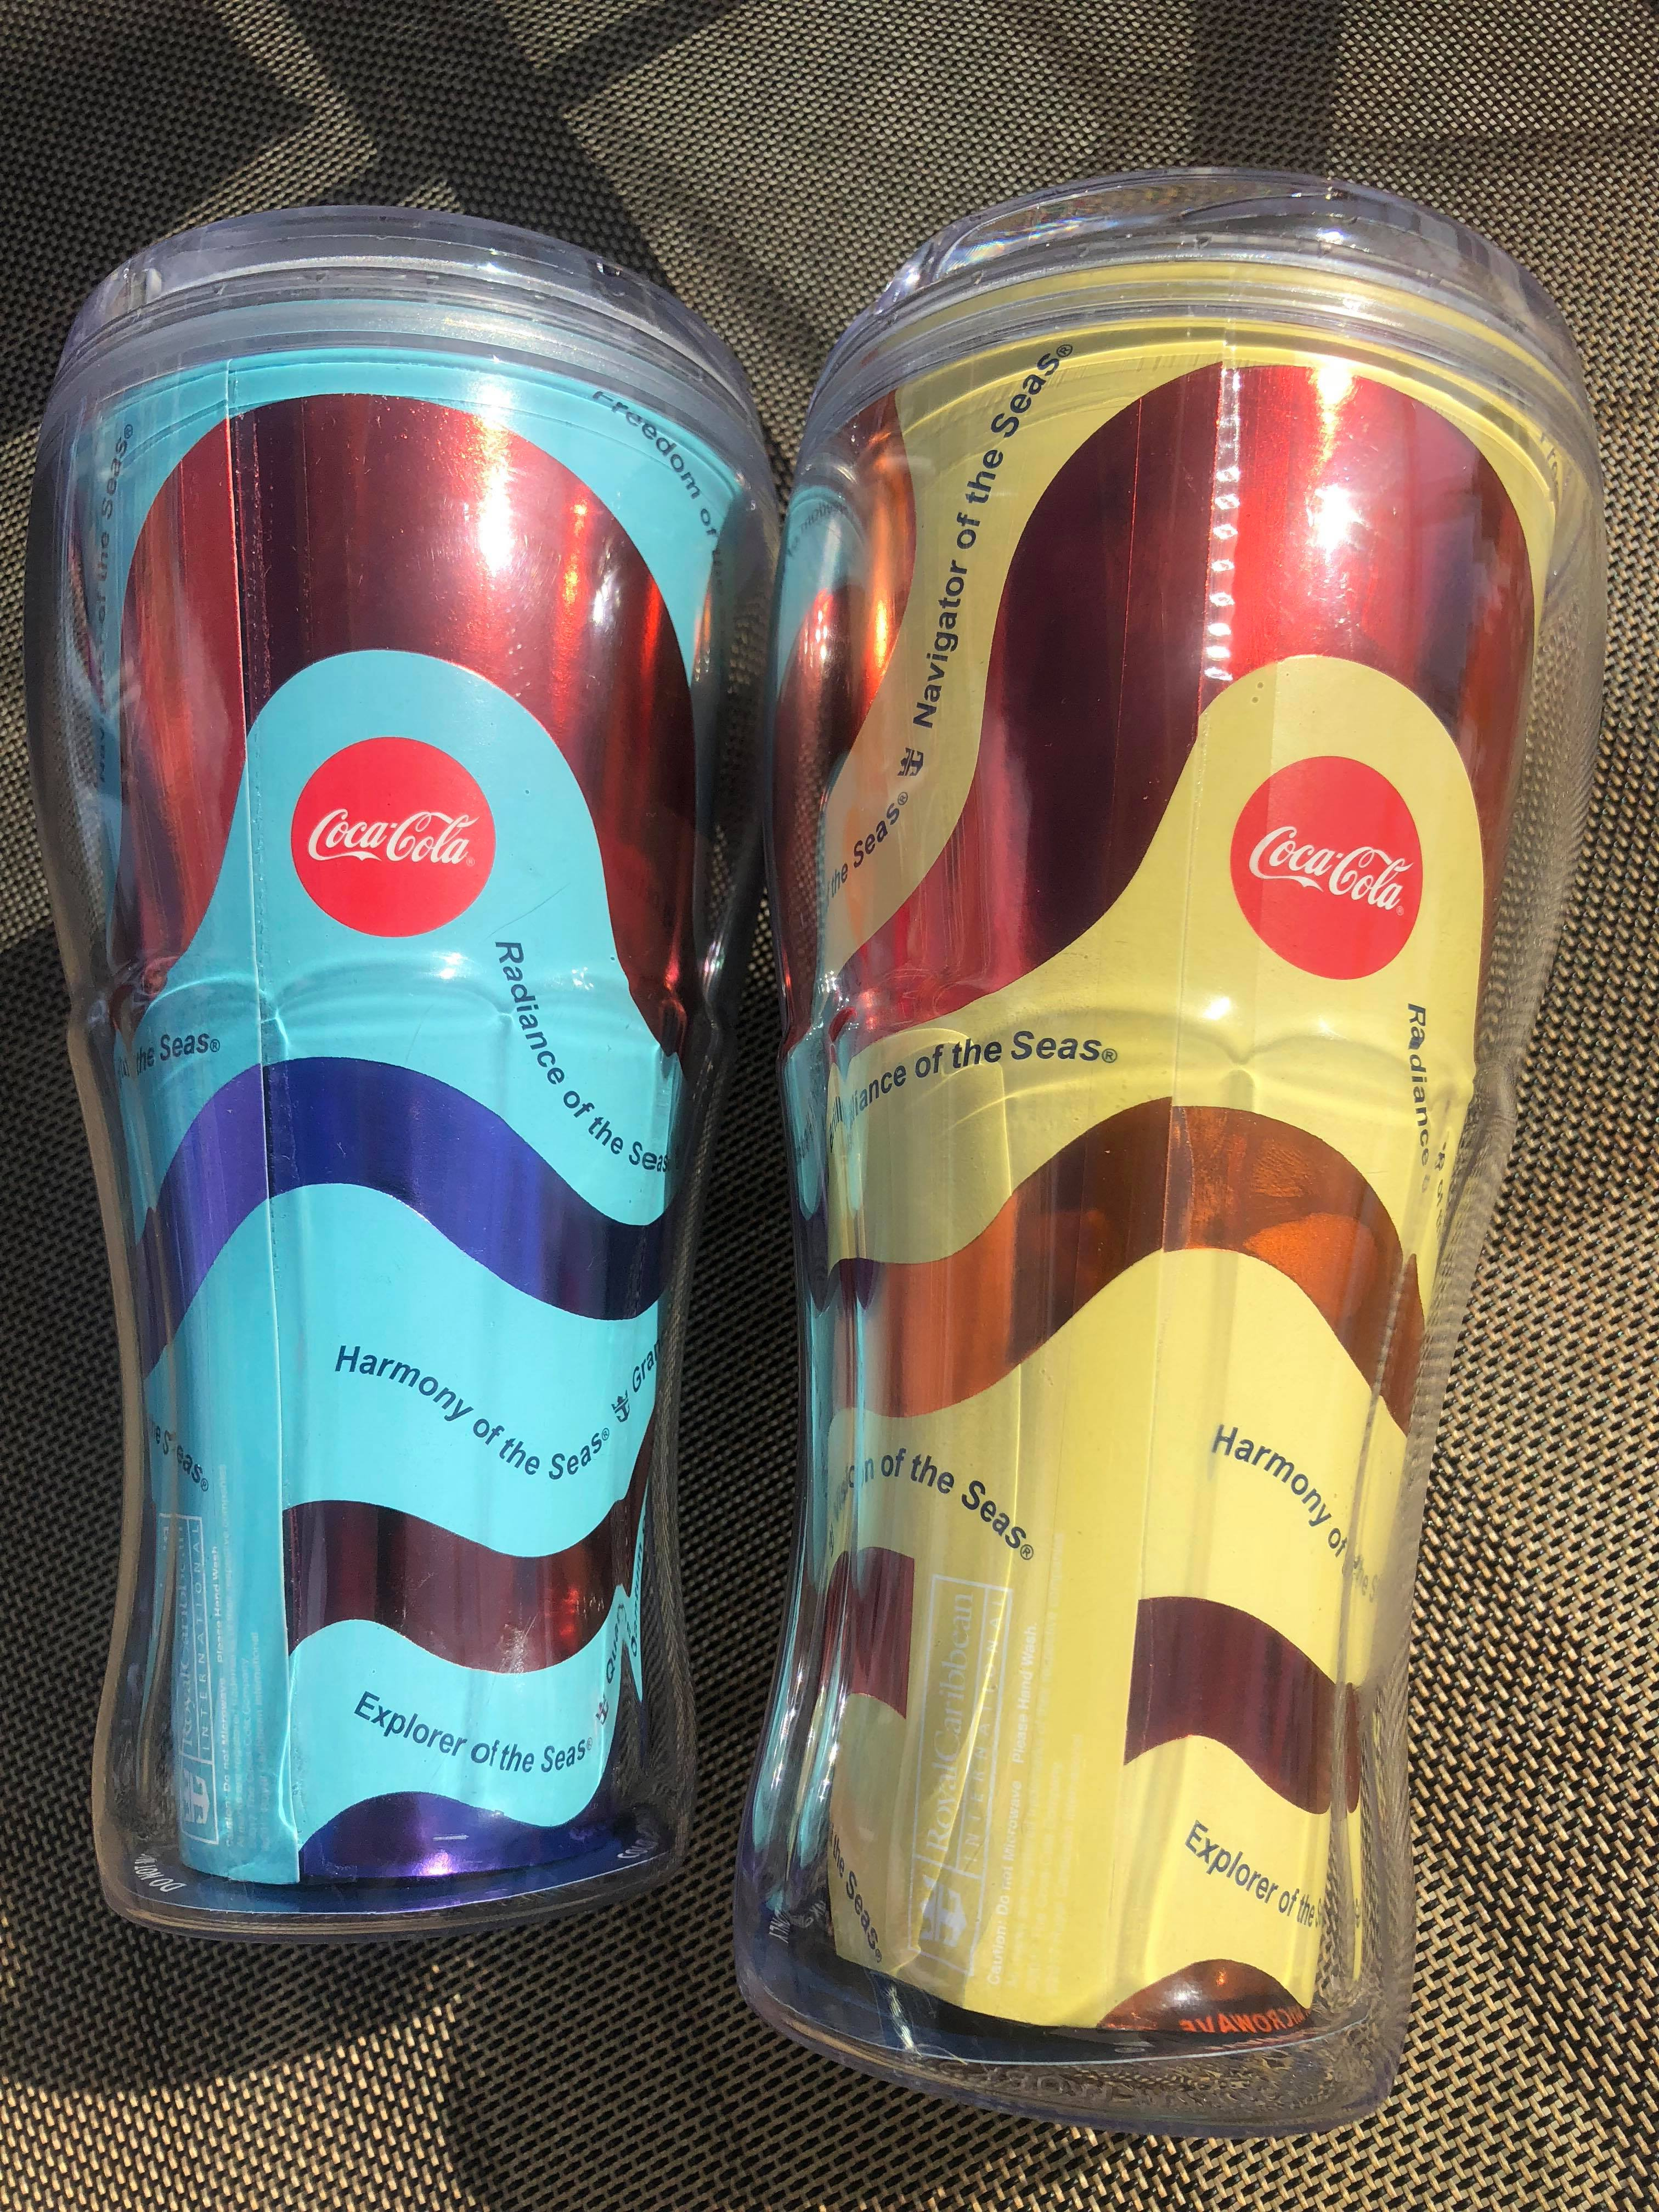 Spotted: New Coca-Cola souvenir cup design | Royal ...